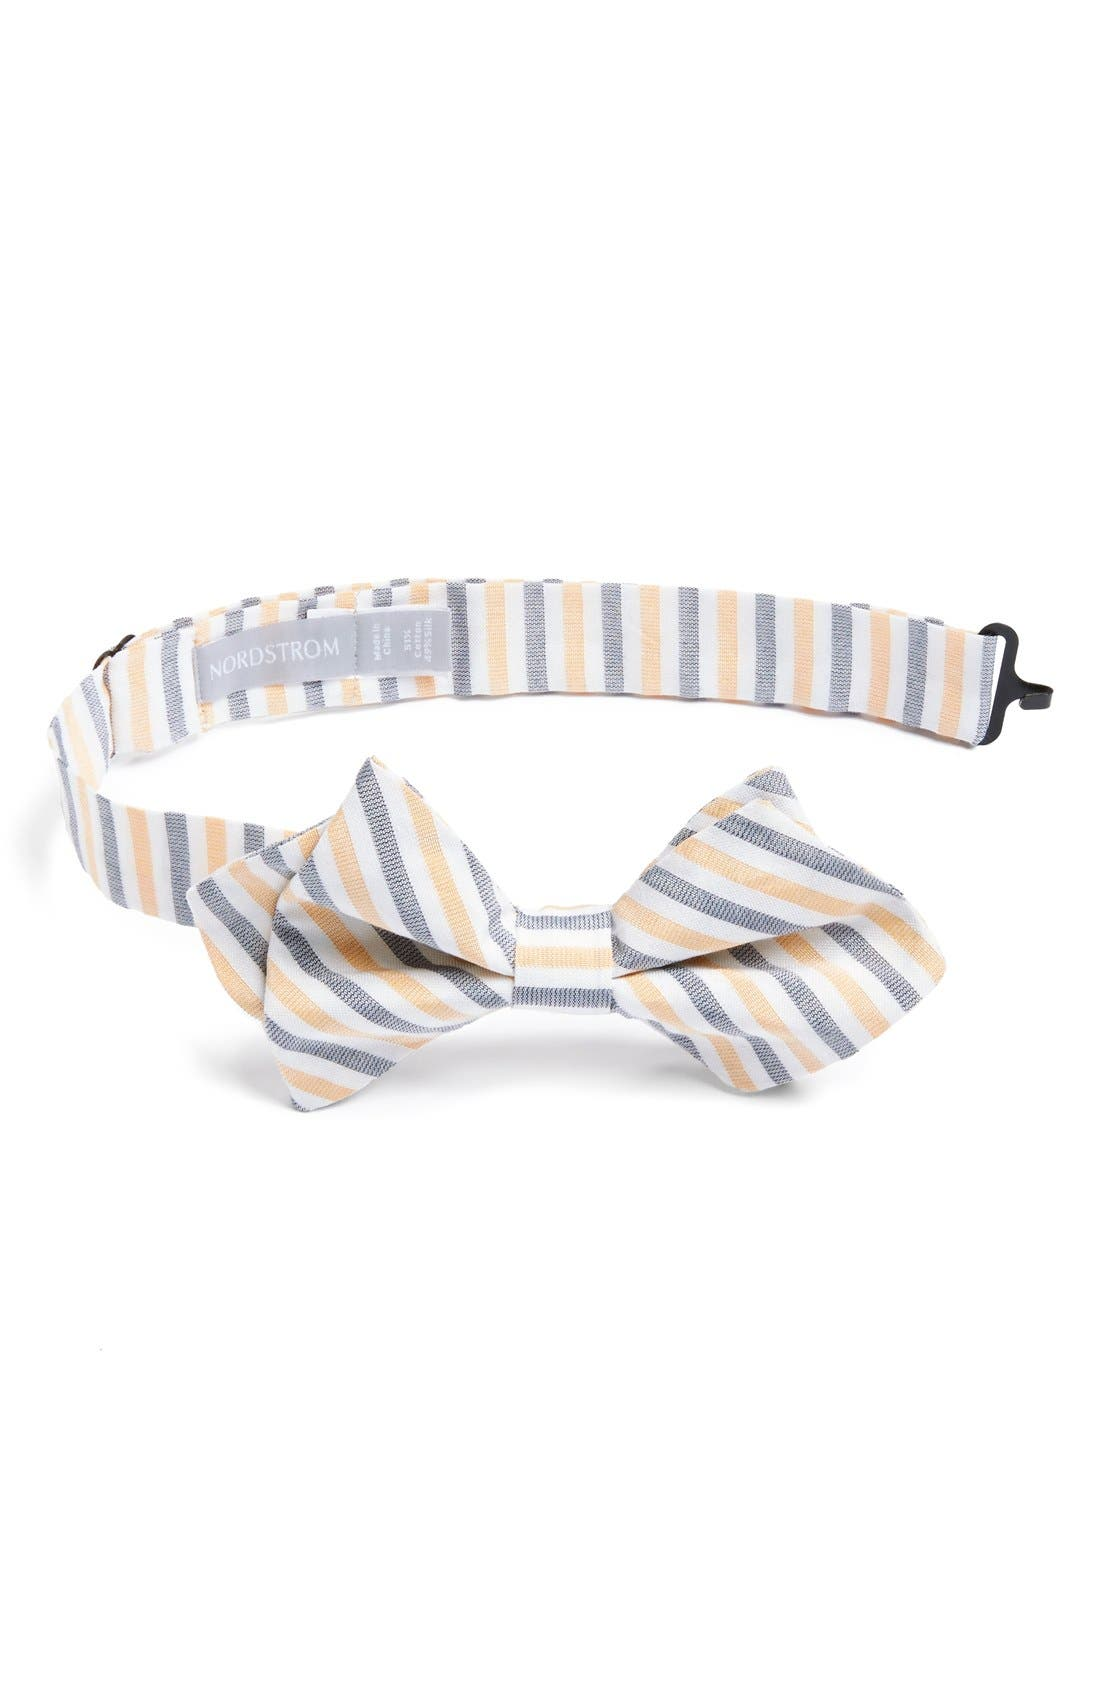 Alternate Image 1 Selected - Nordstrom Cotton & Silk Bow Tie (Big Boys)